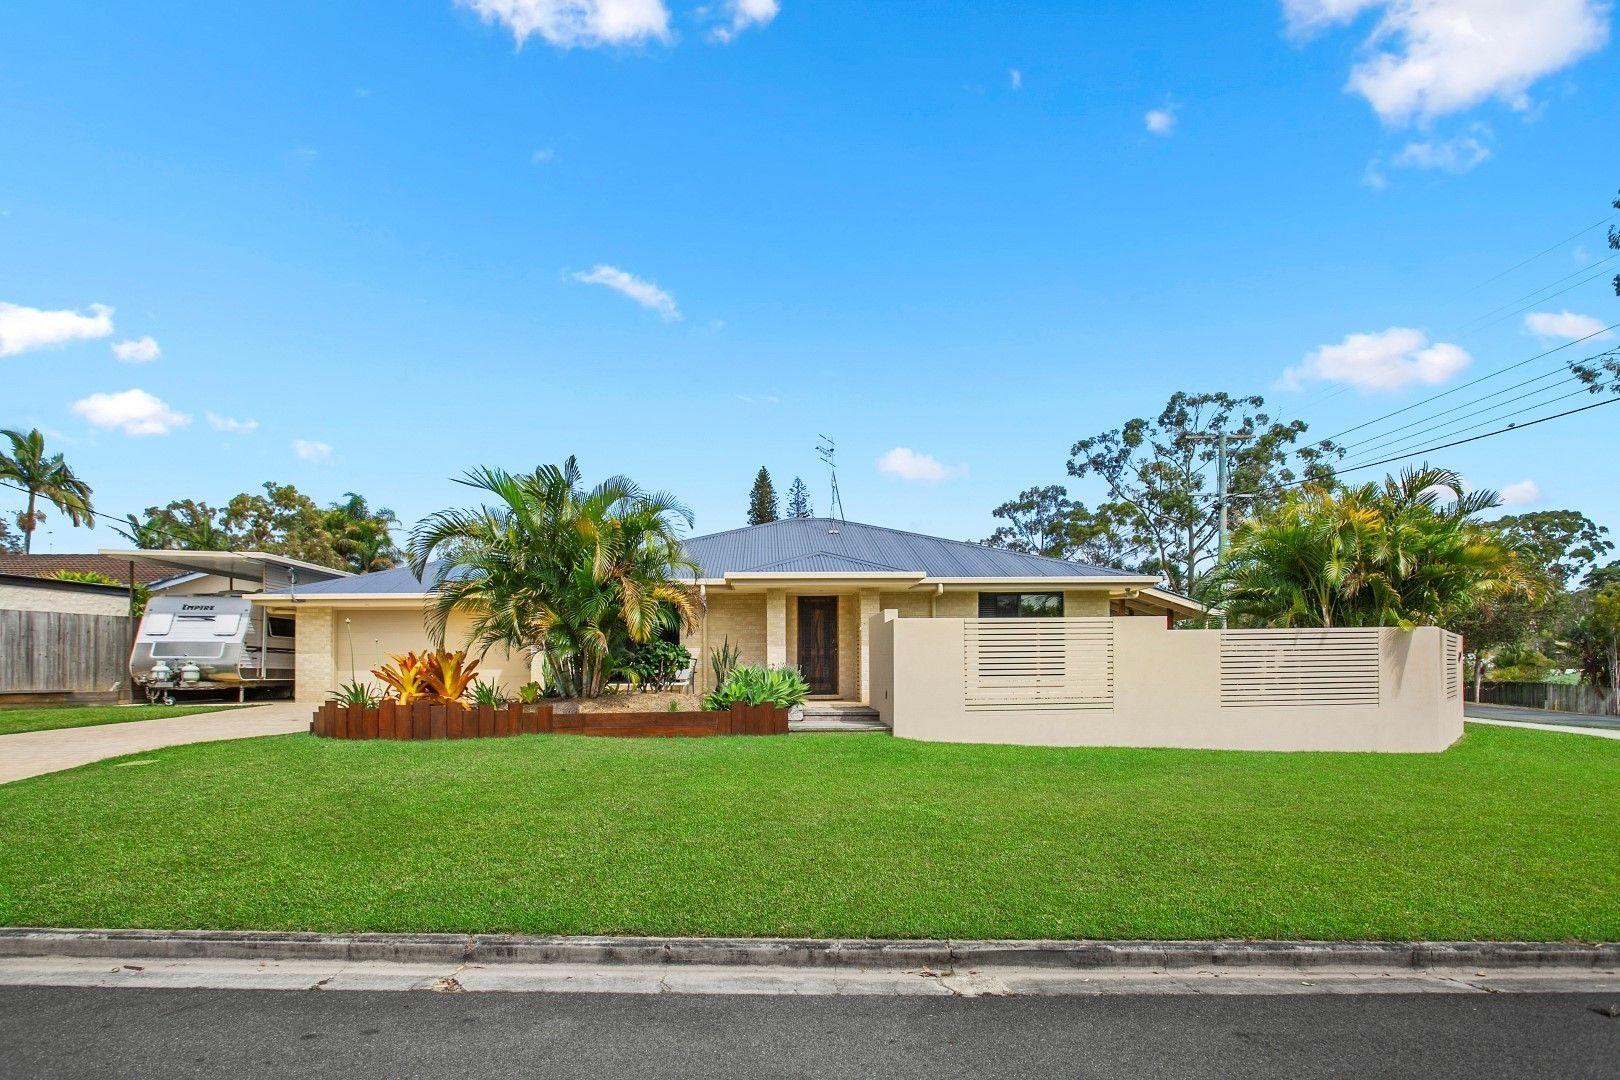 63 George Street, Tewantin QLD 4565, Image 0